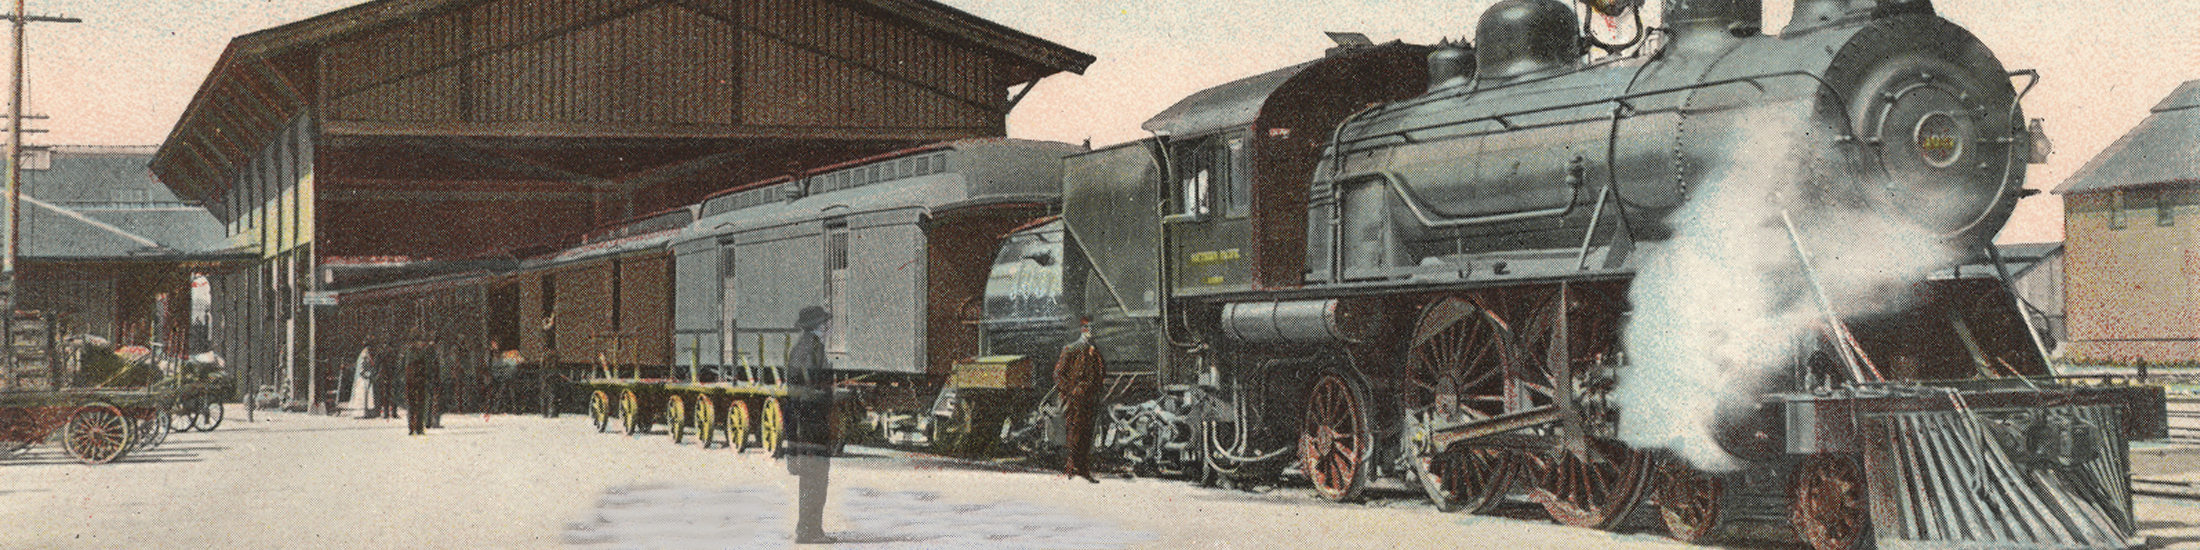 Train station postcard